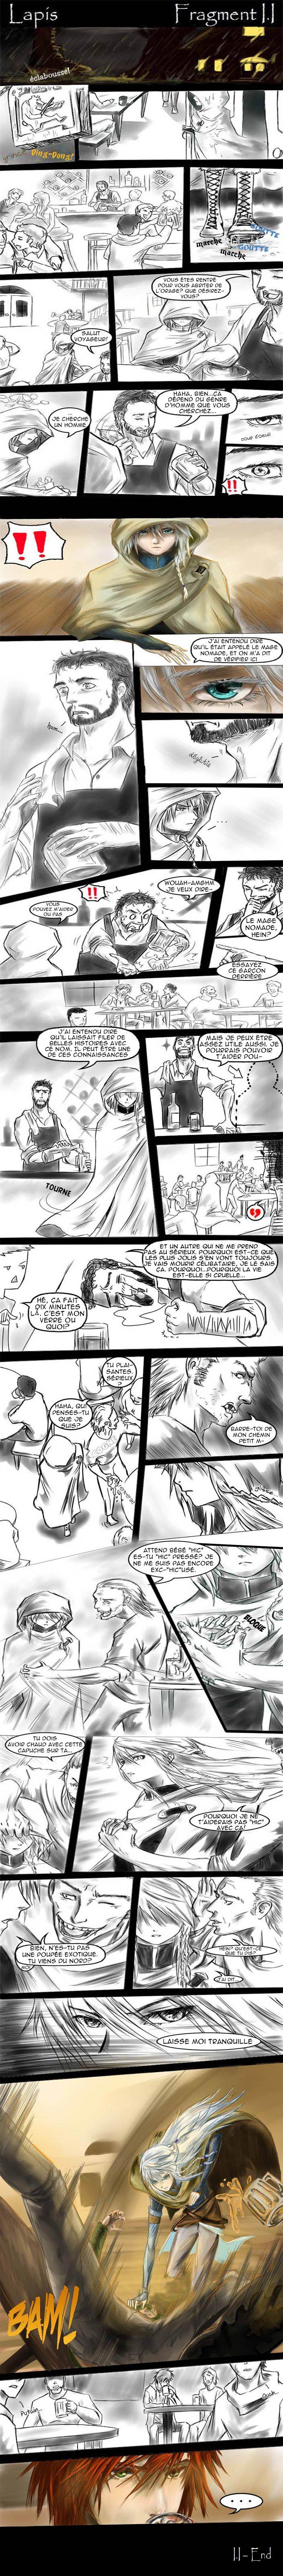 https://nine.mangadogs.com/fr_manga/pic1/58/954/44497/Lapis1VF_0_921.jpg Page 1